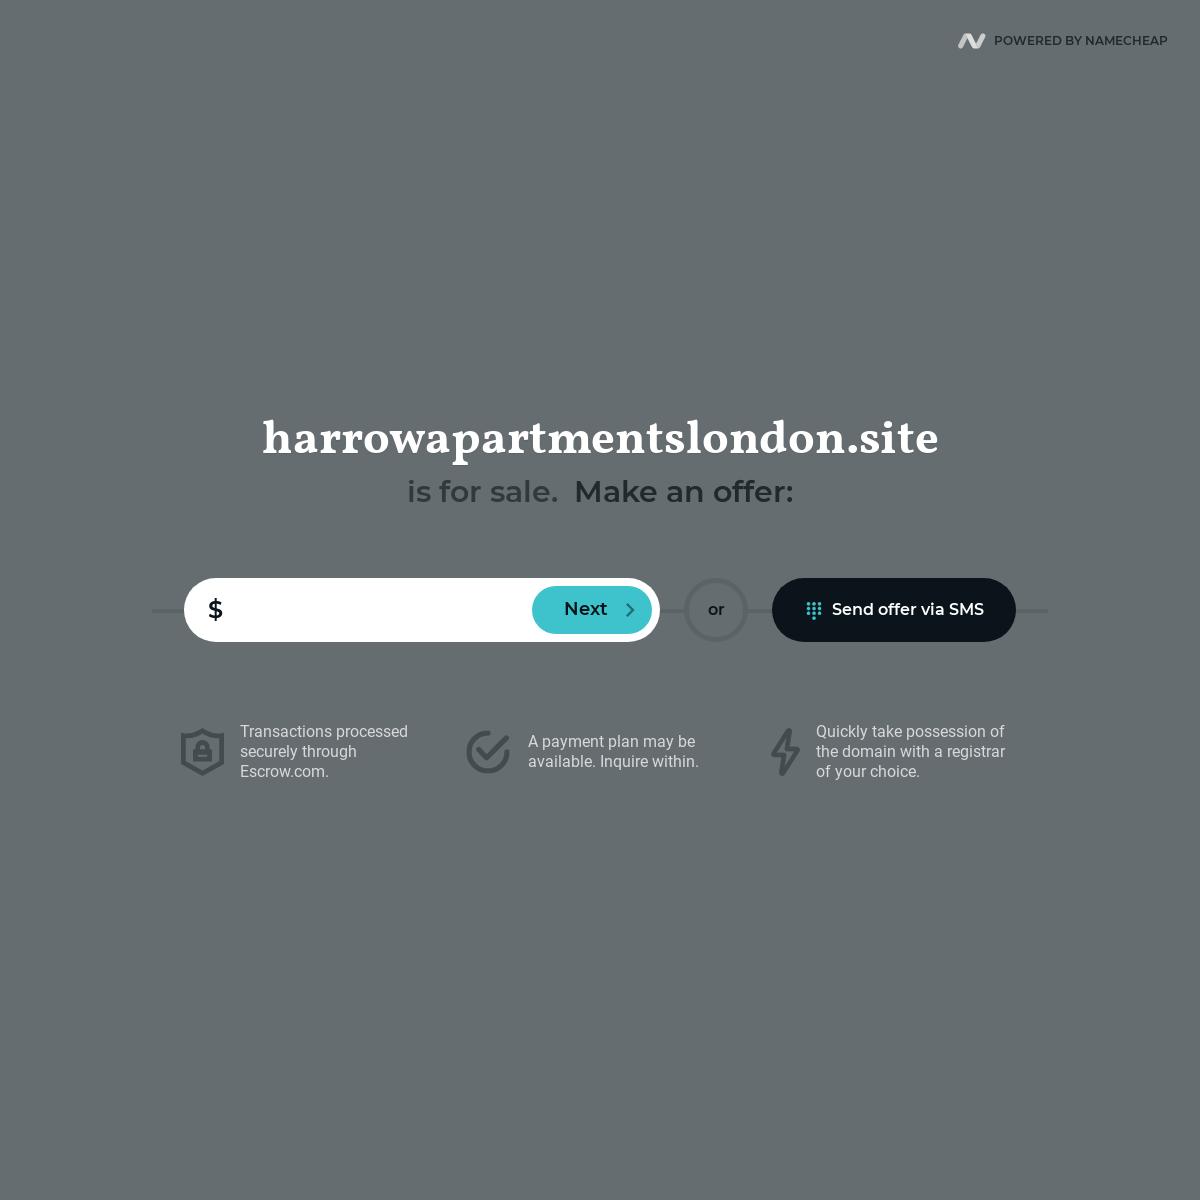 harrowapartmentslondon.site is for sale